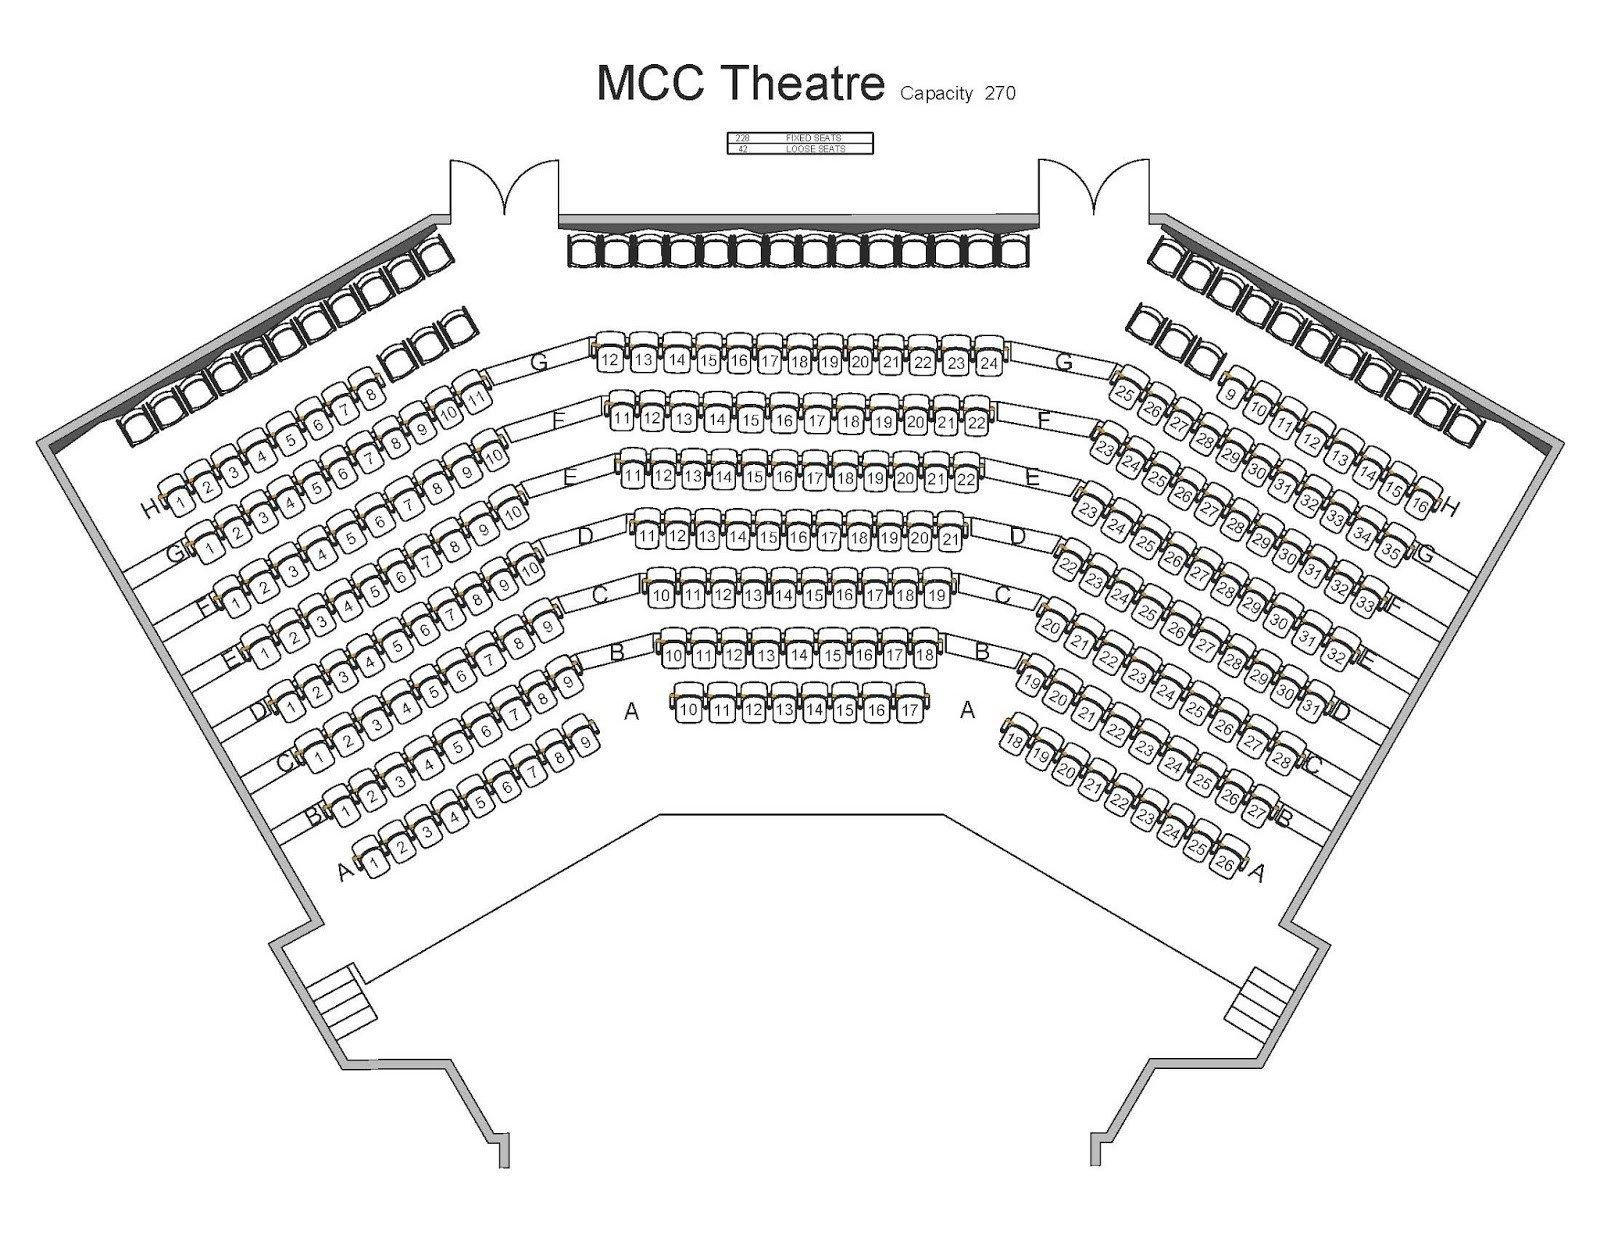 Auditorium Seating Chart Template Mahaffey theater Seating Chart